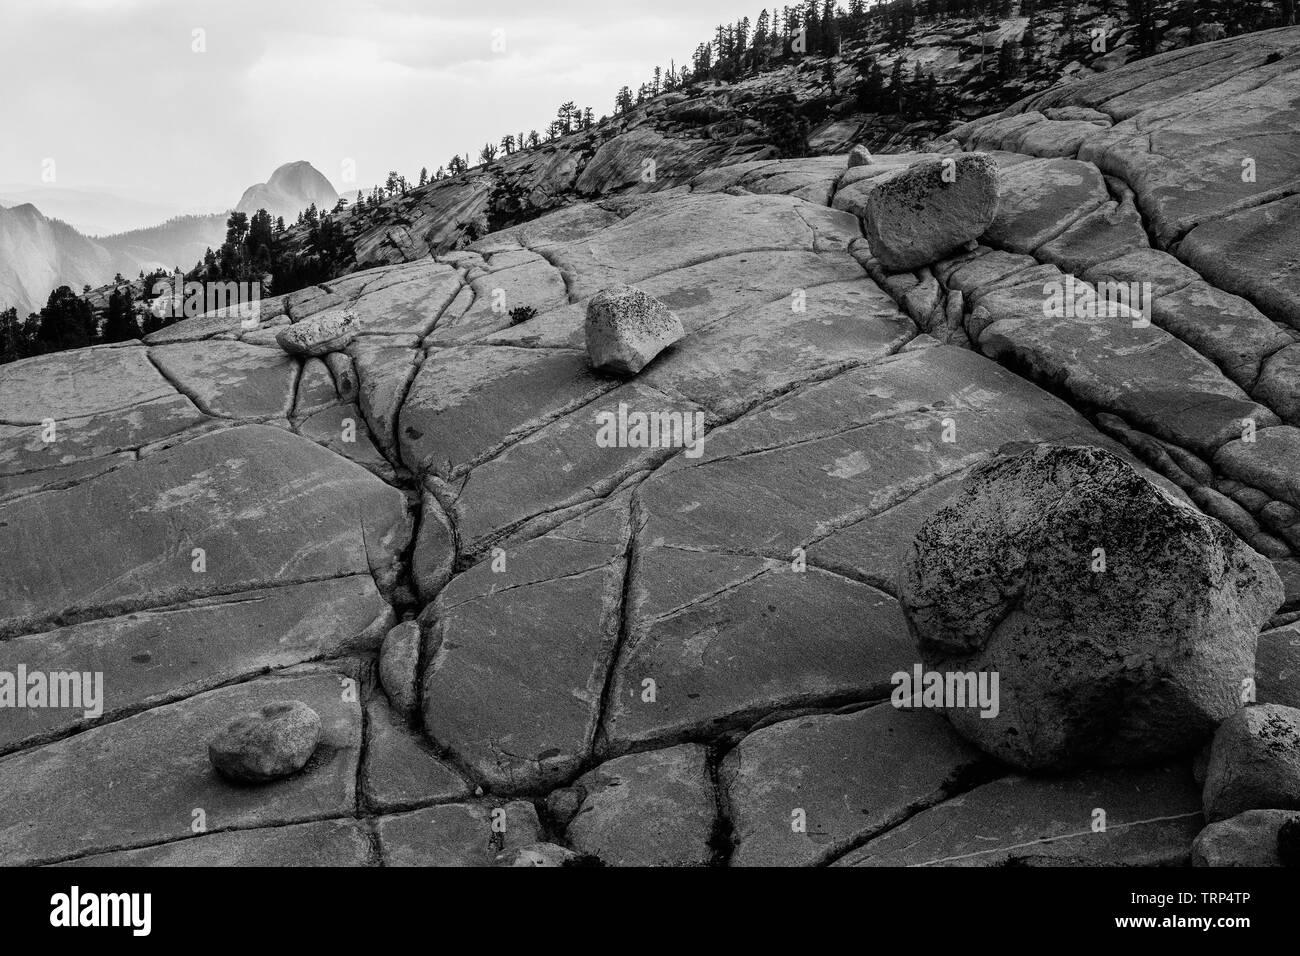 Tioga Pass Road,California, Lee Vining,Yosemite-Nationalpark,mountains,tree,pine, stones,valley,Landschaftsaufnahme,Schwarz/Weiss - Stock Image